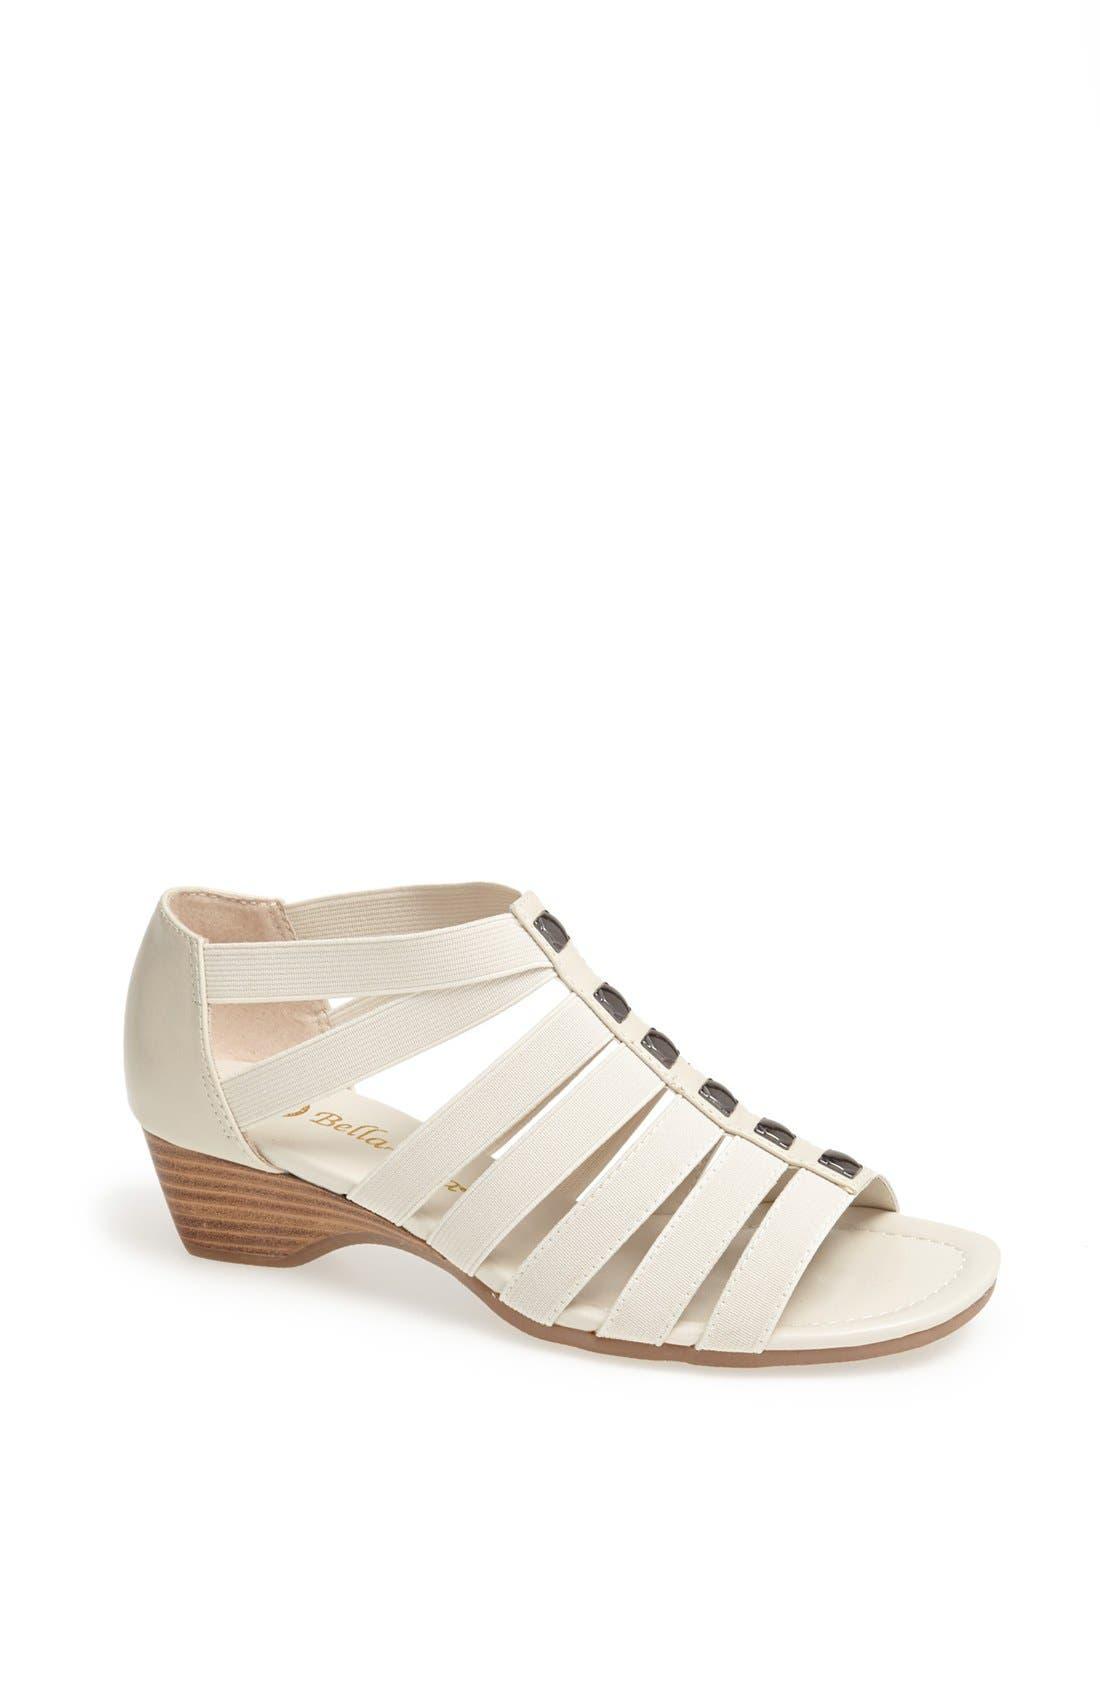 Bella Vita 'Paula II' Sandal